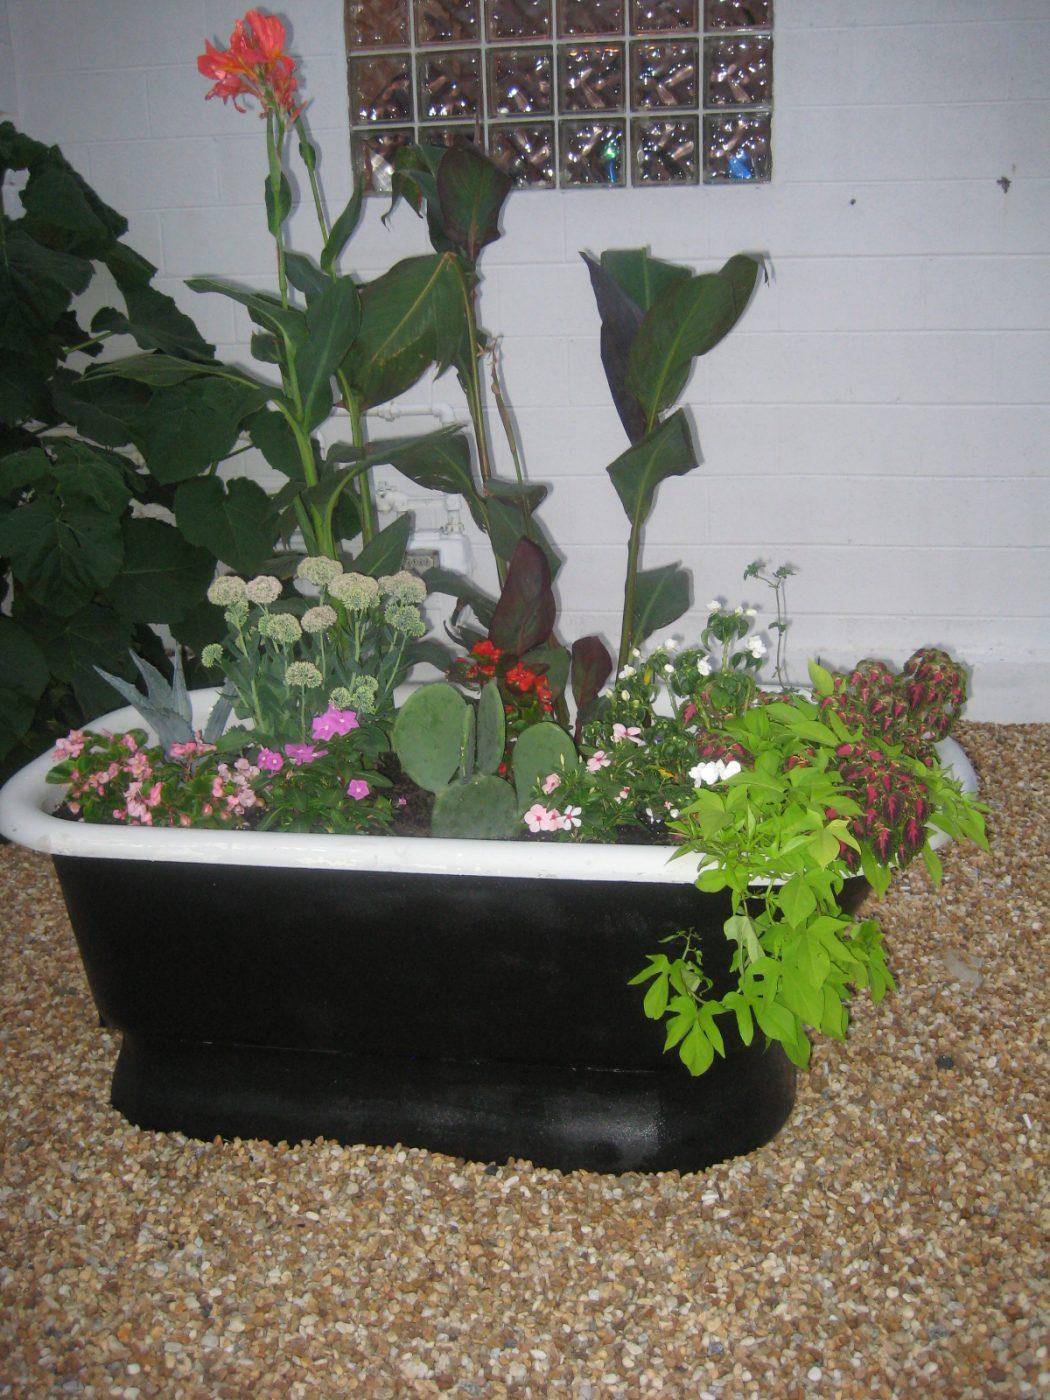 bathtub-planter 10 Fascinating and Unique Ideas for Portable Gardens